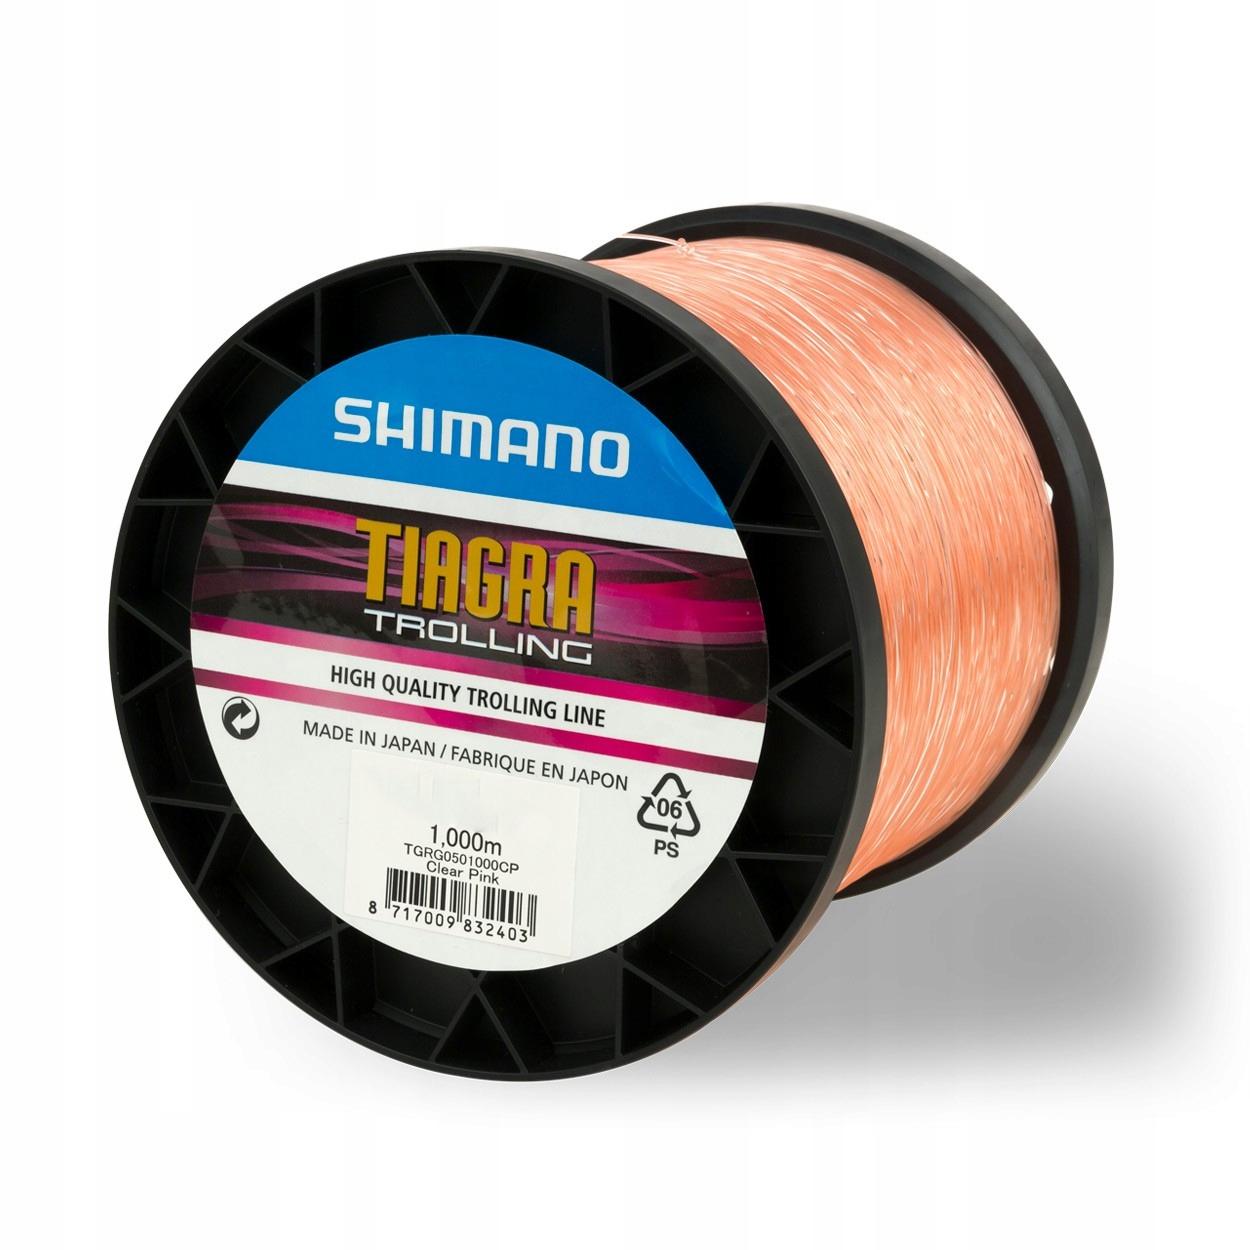 Shimano Tiagra Trolling Jasné, Ružová 0.90 mm/1000 m